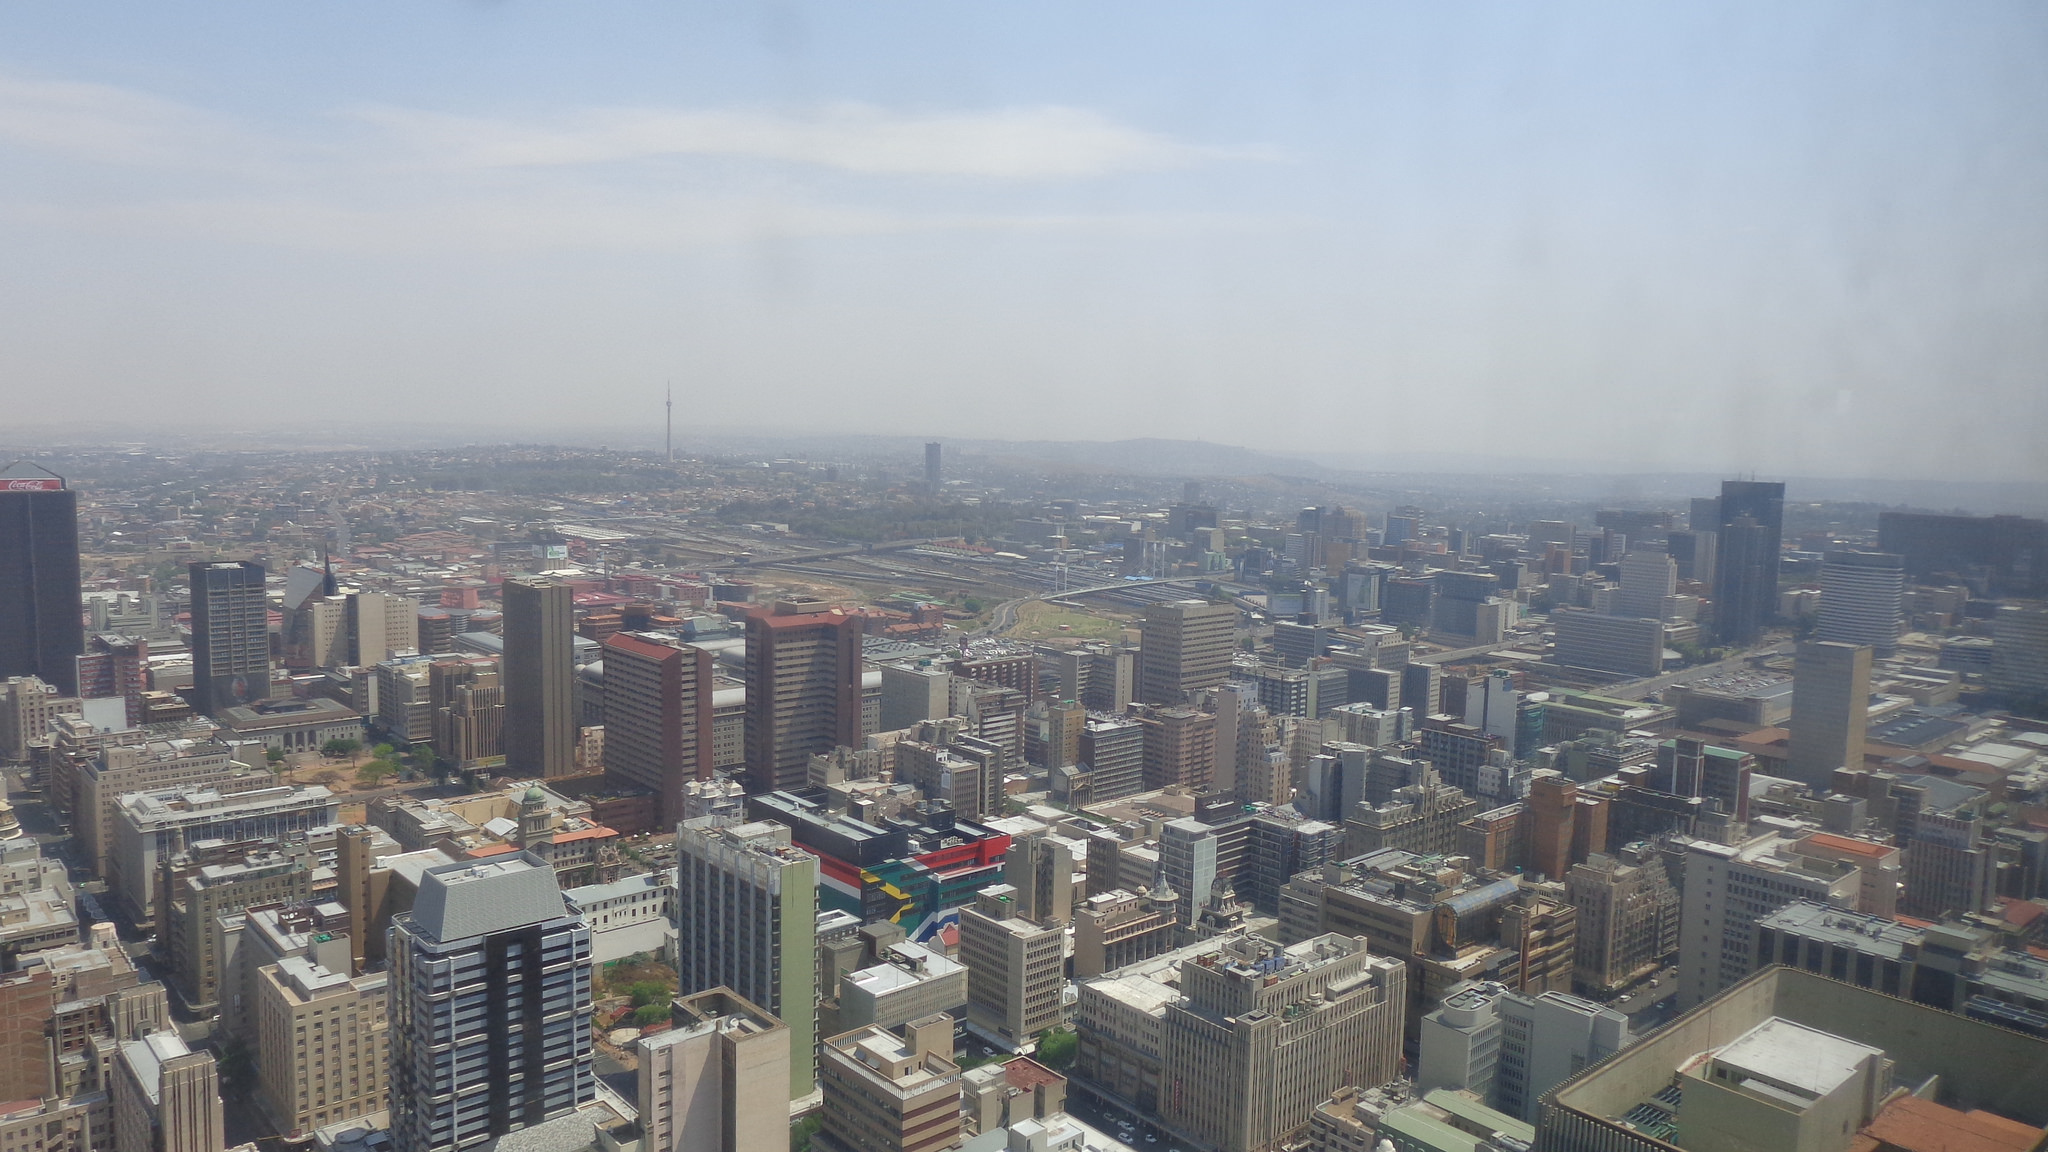 Johannesburg skyline. Source:  Rckr88 Flickr stream  (CC)